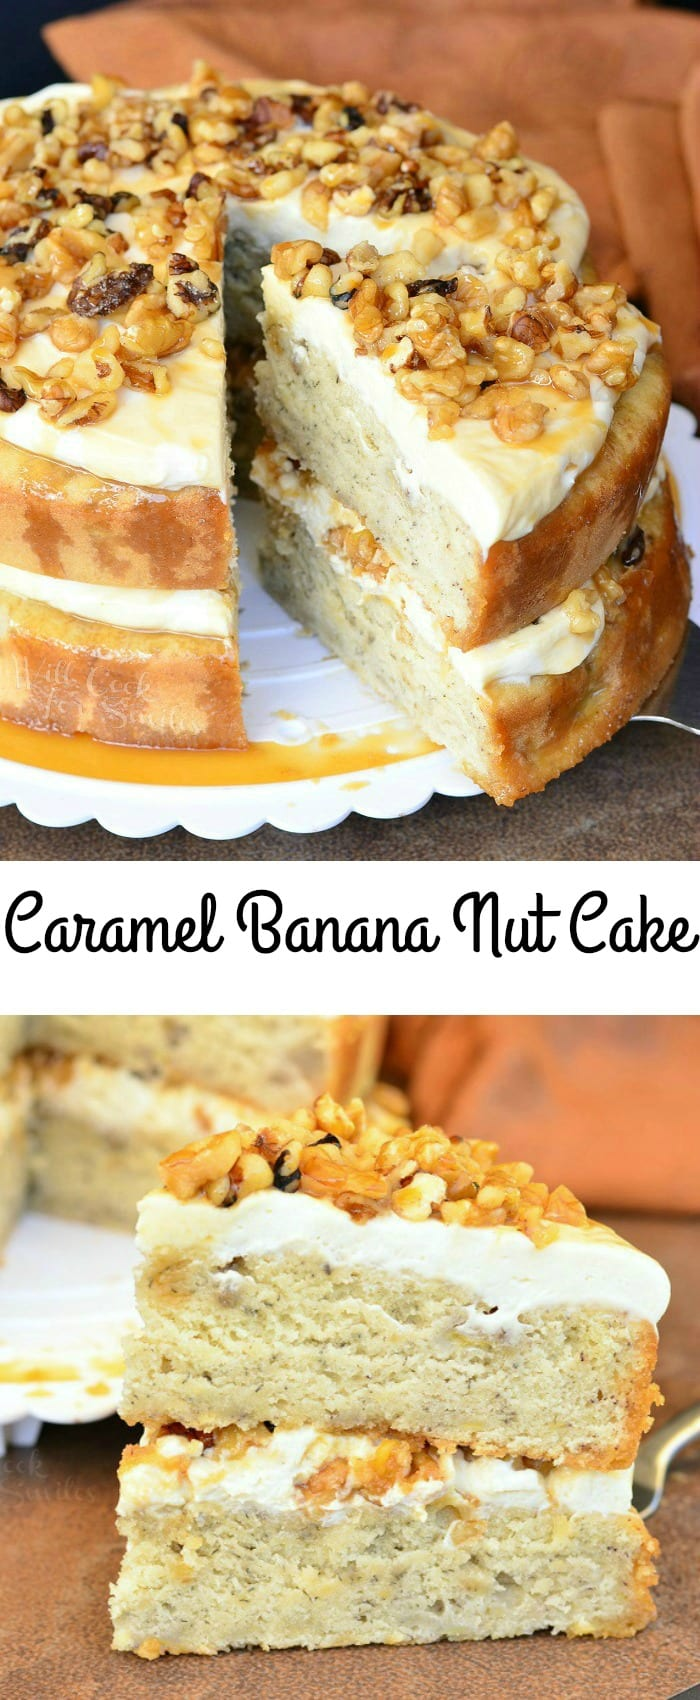 how to make nut cake